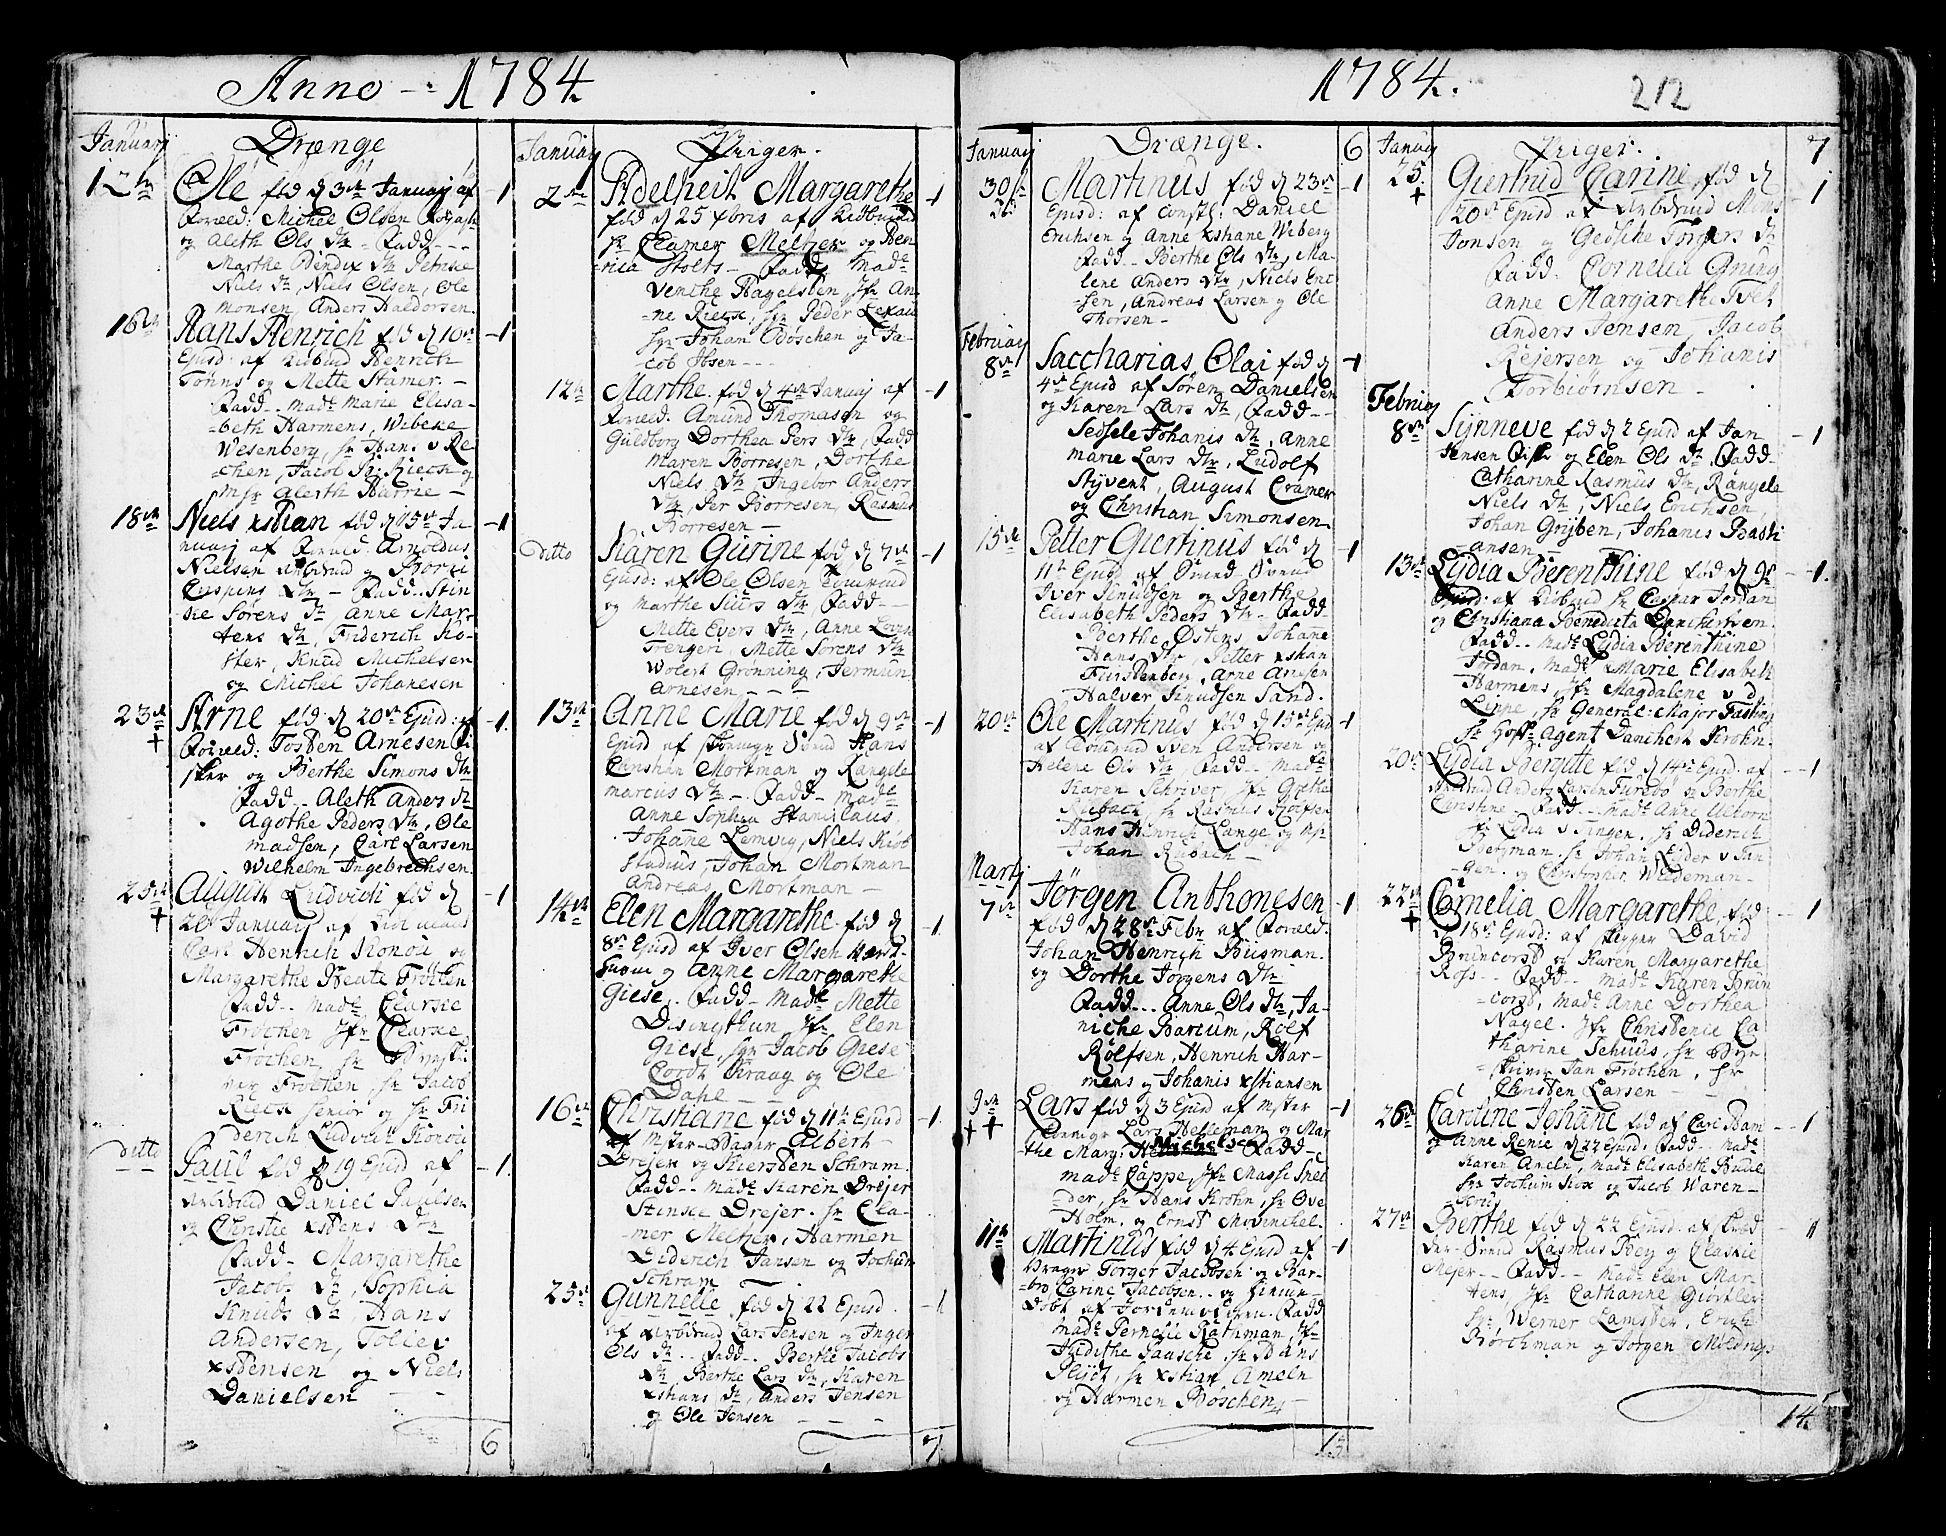 SAB, Korskirken Sokneprestembete, H/Haa/L0005: Ministerialbok nr. A 5, 1751-1789, s. 212